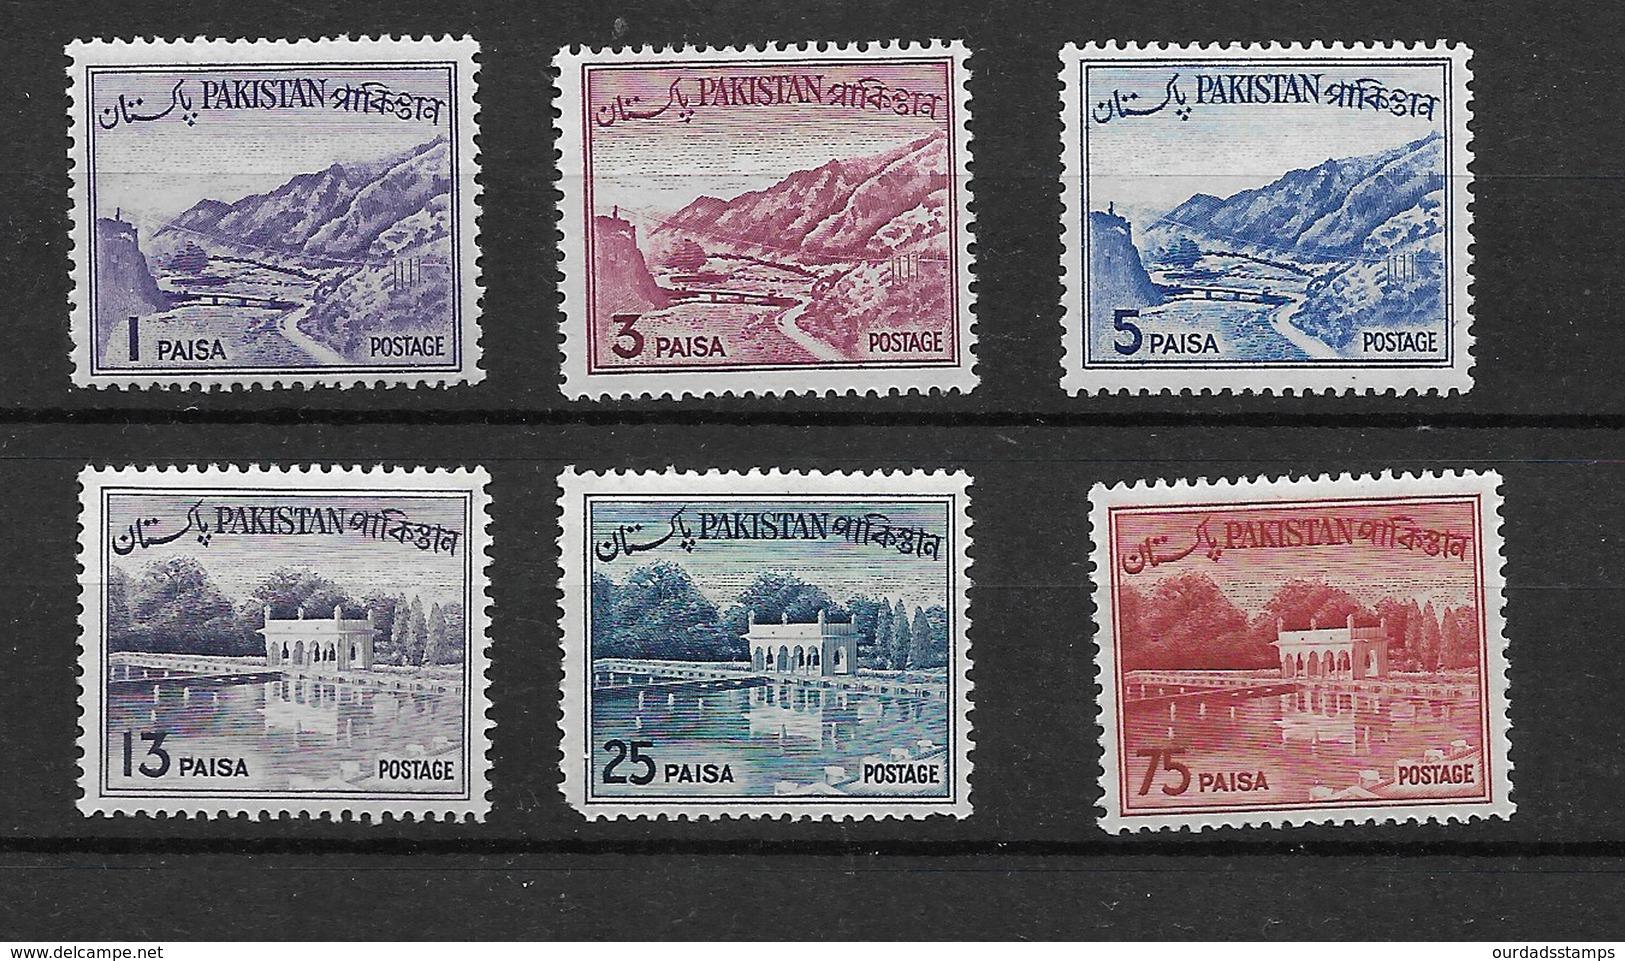 Pakistan 1961 Khyber Pass/Shalimar Gardens, Selection To 75p Mint (5067) - Pakistan